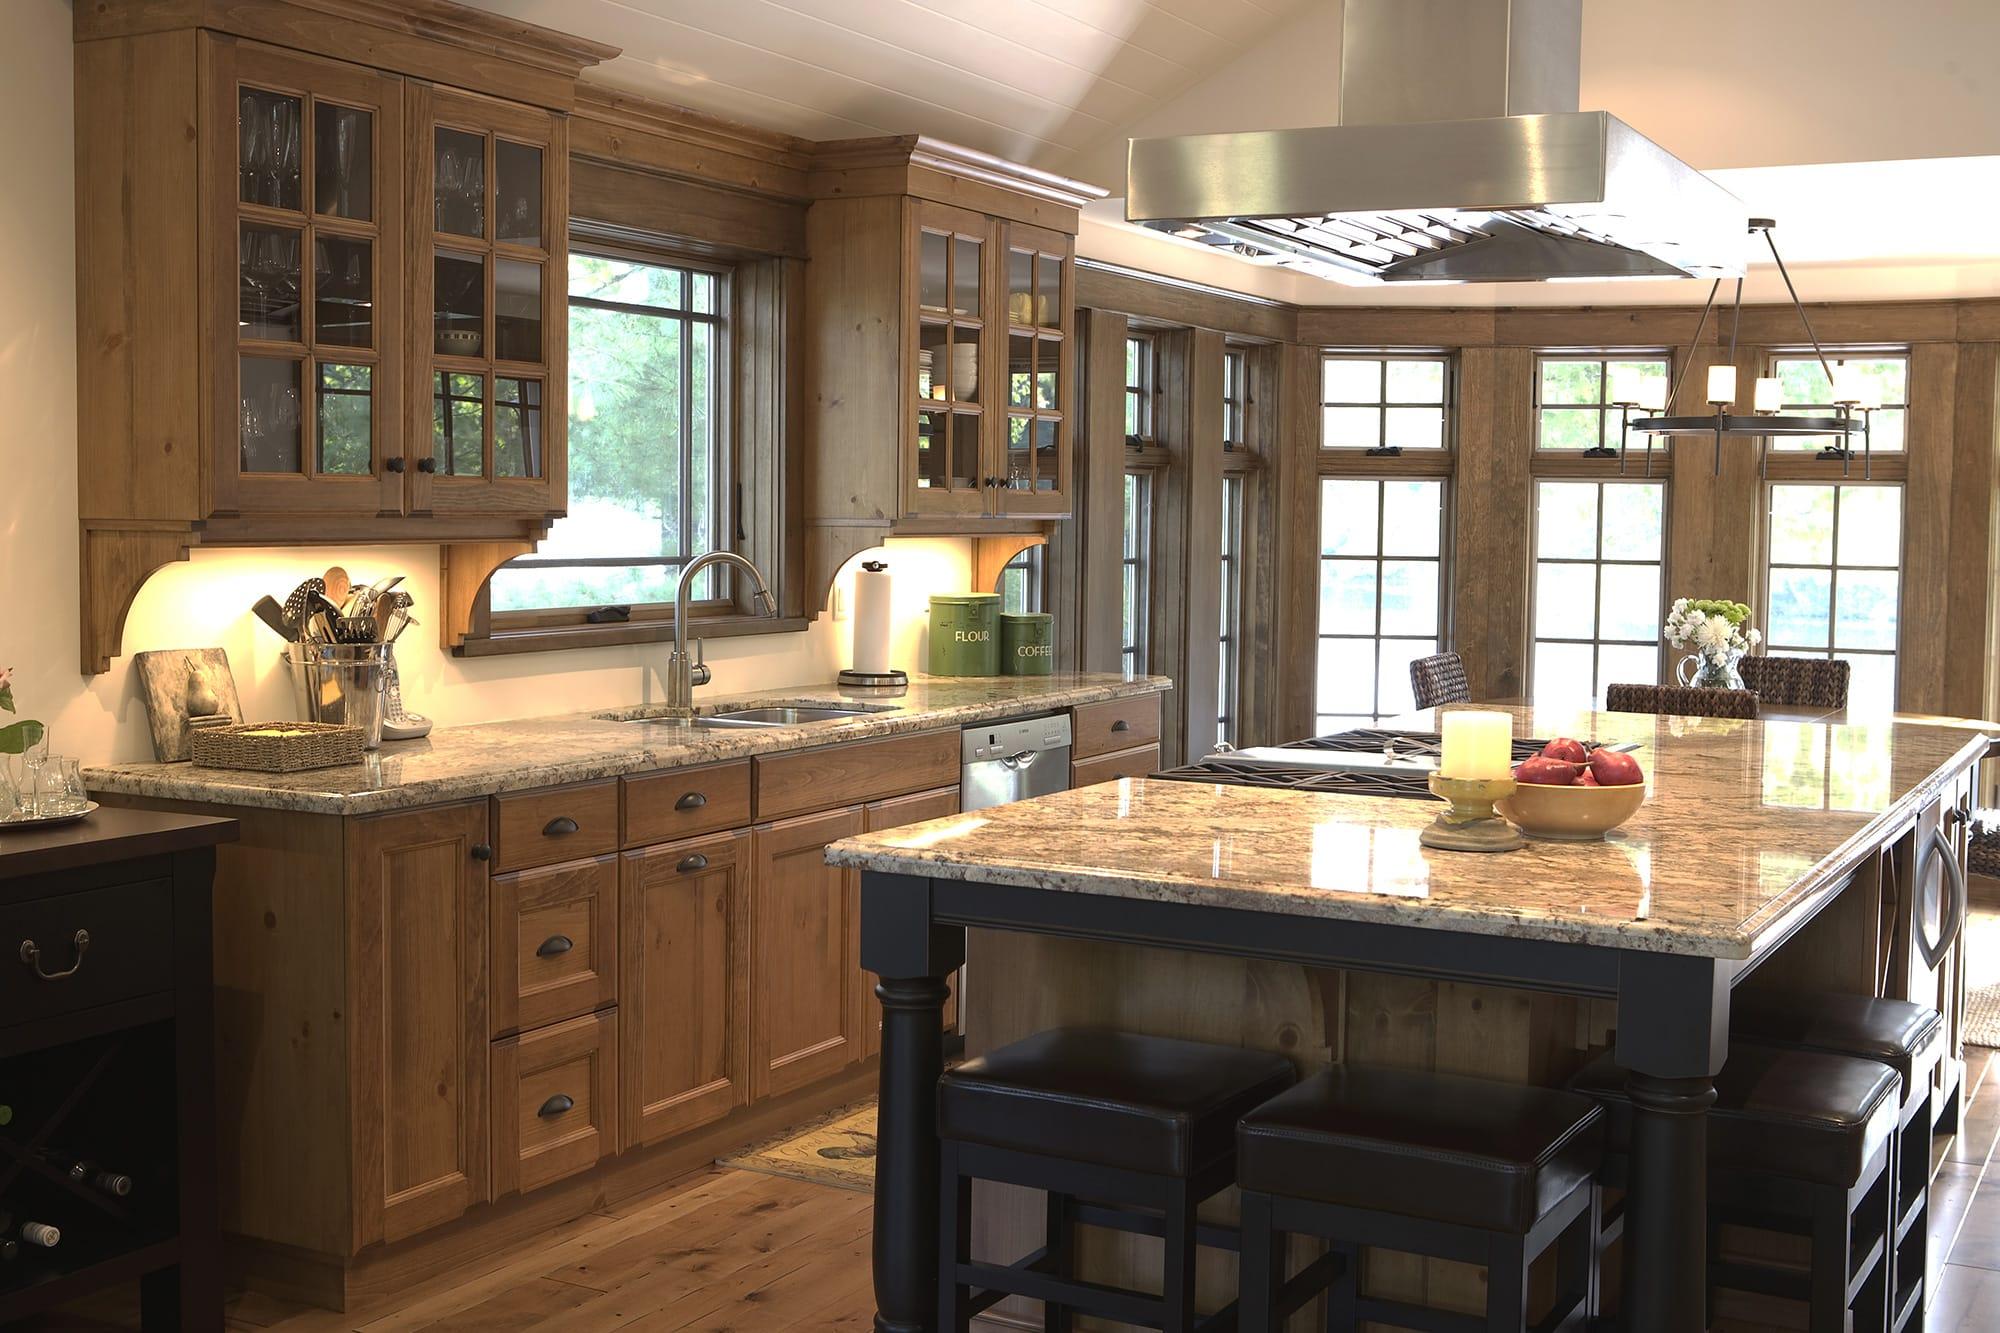 kitchen and bath showroom utensils set kitchens | northern living ltd.